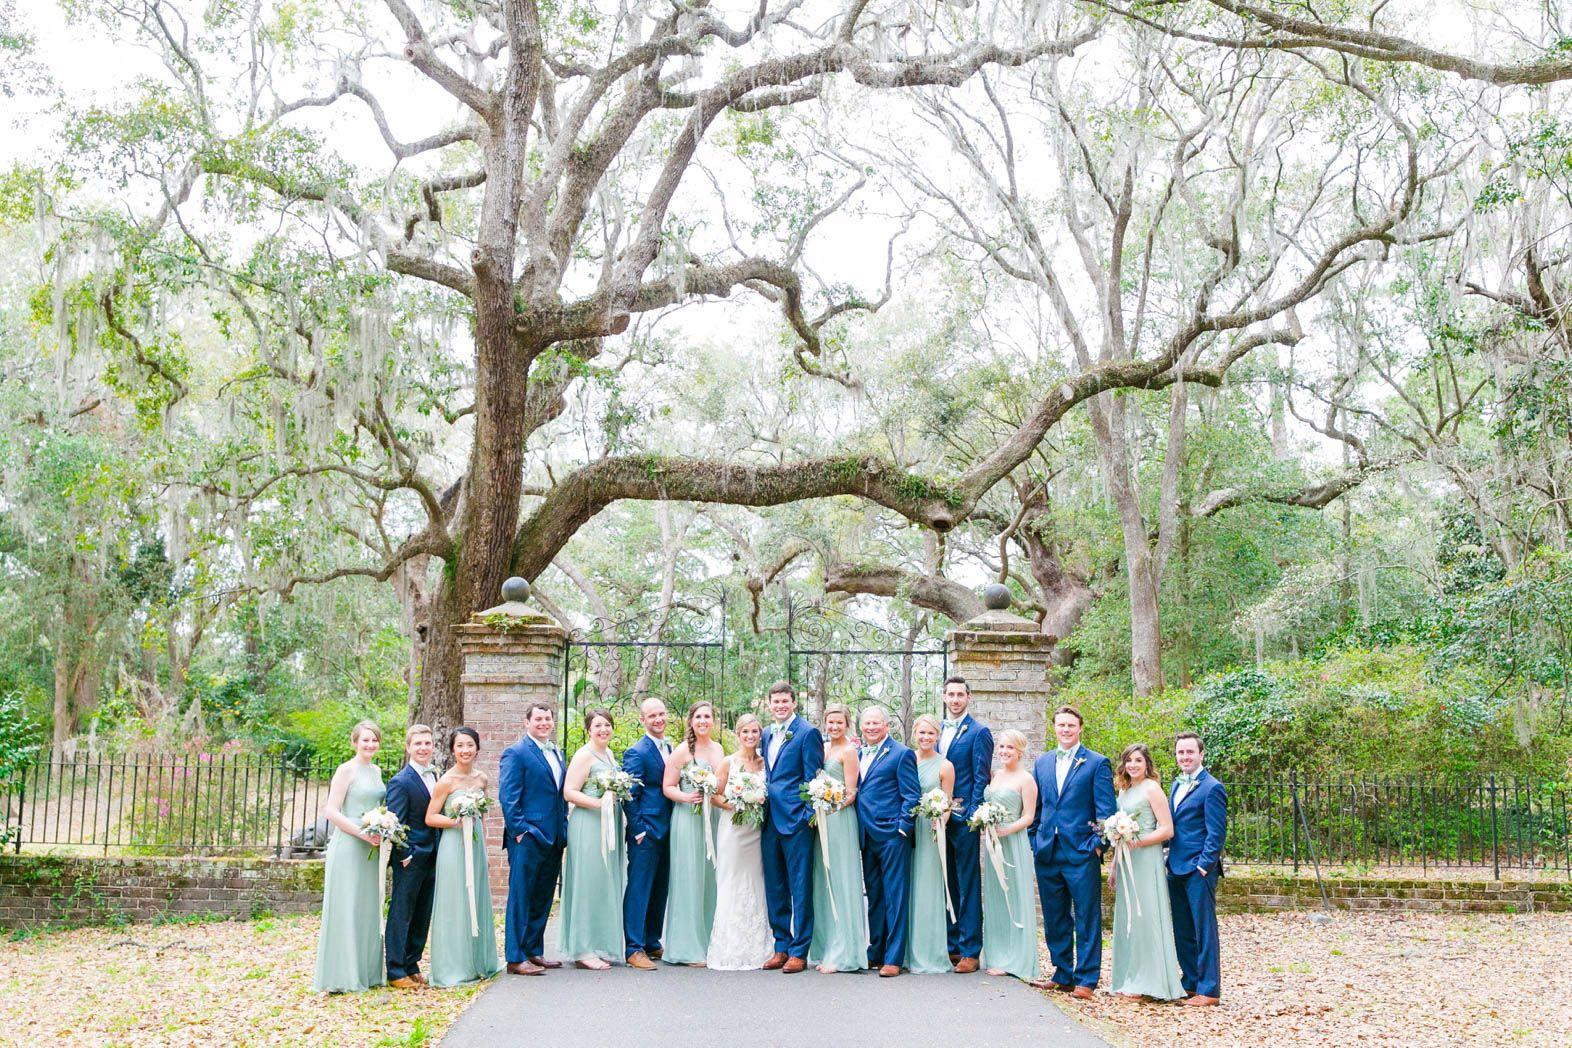 Sage Green Bridesmaid Dresses Groomsmen In Blue Suits Pastel Garden Wedding At Legare War Blue Groomsmen Sage Green Bridesmaid Dress Sage Bridesmaid Dresses